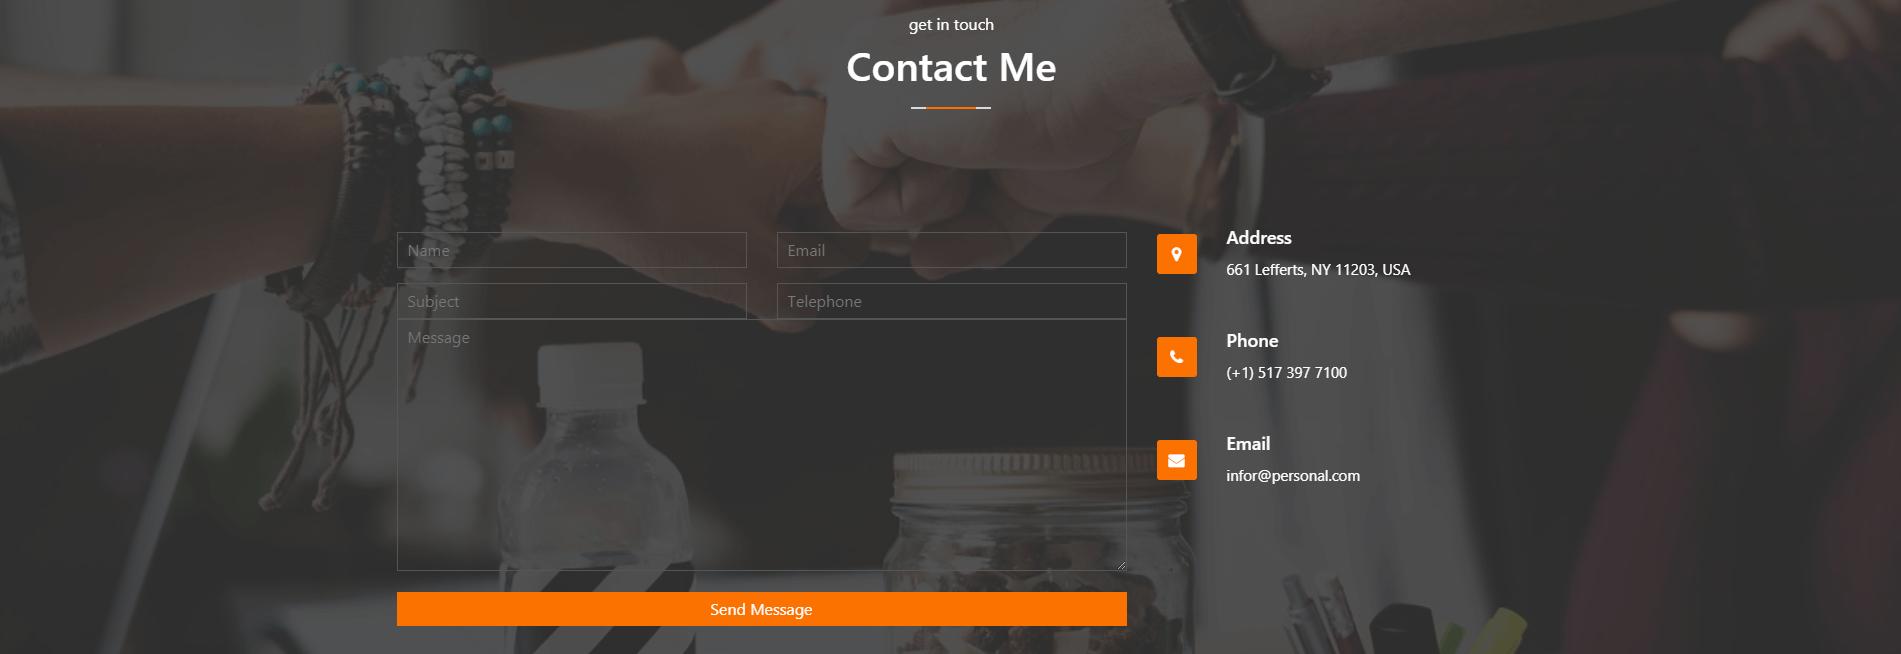 Cách Tạo Contact Form Bootstrap